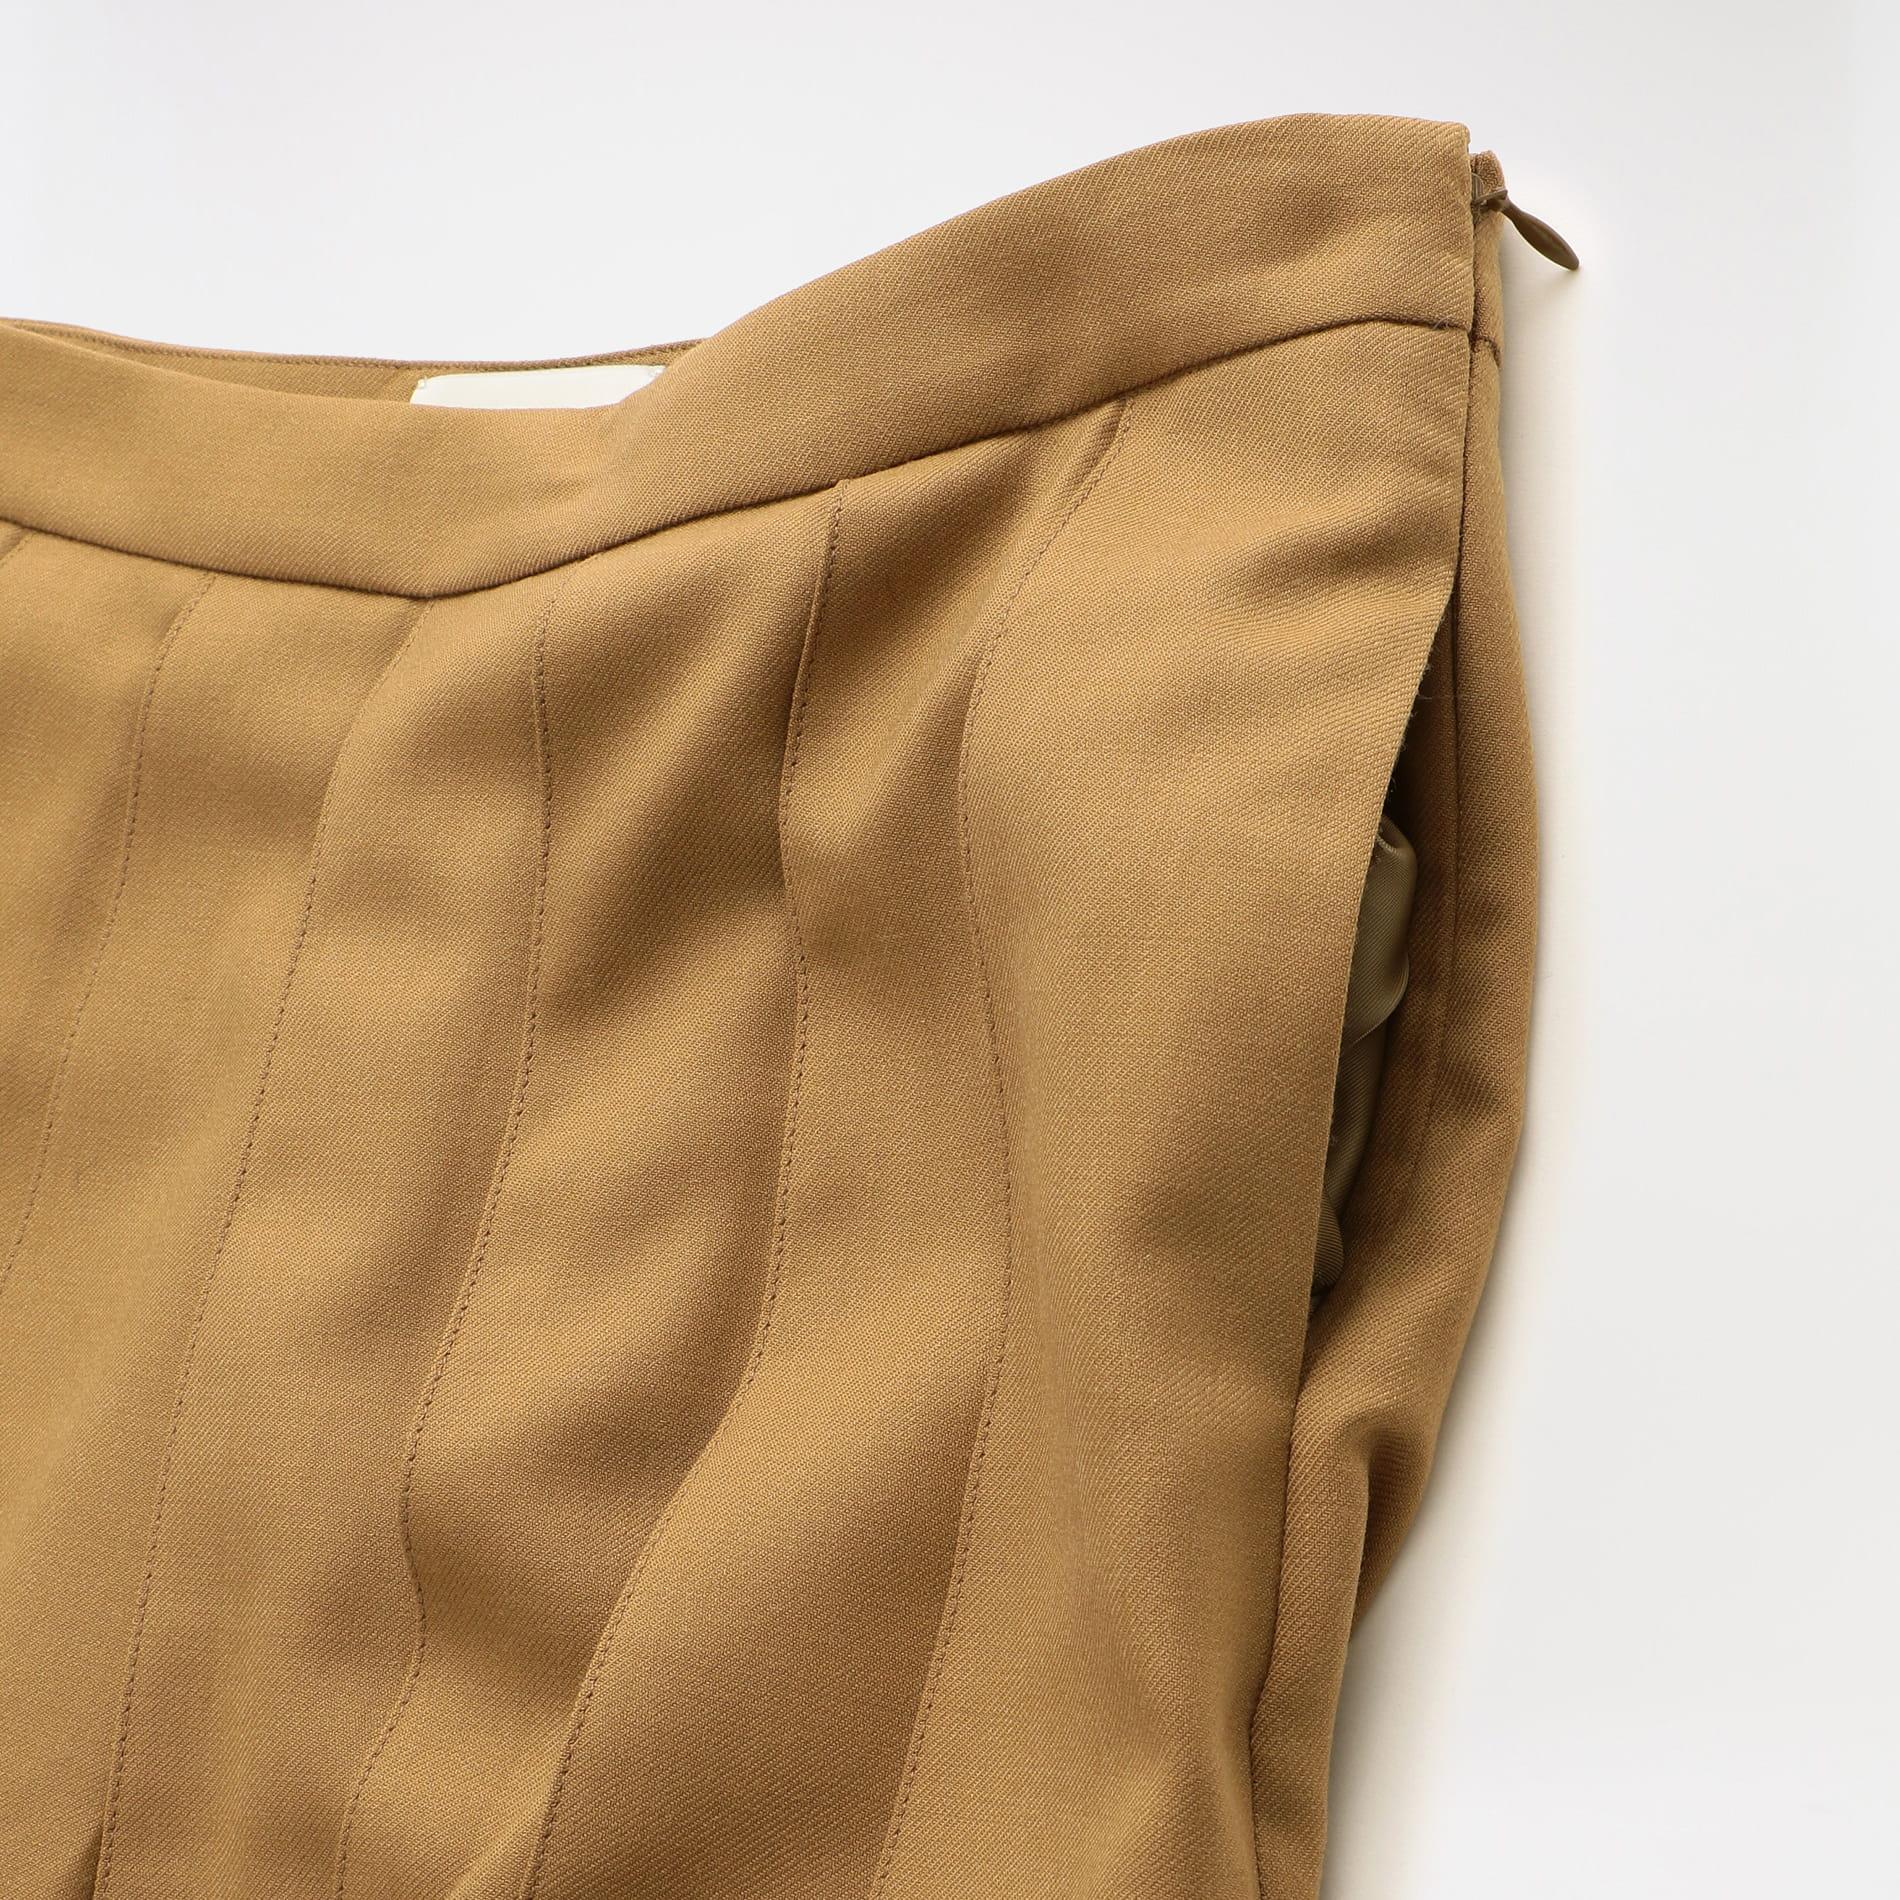 【KIRIN】WOMEN SUITING PLEATED PANTS KWCA014F20FAB0016200 KWCF20-031